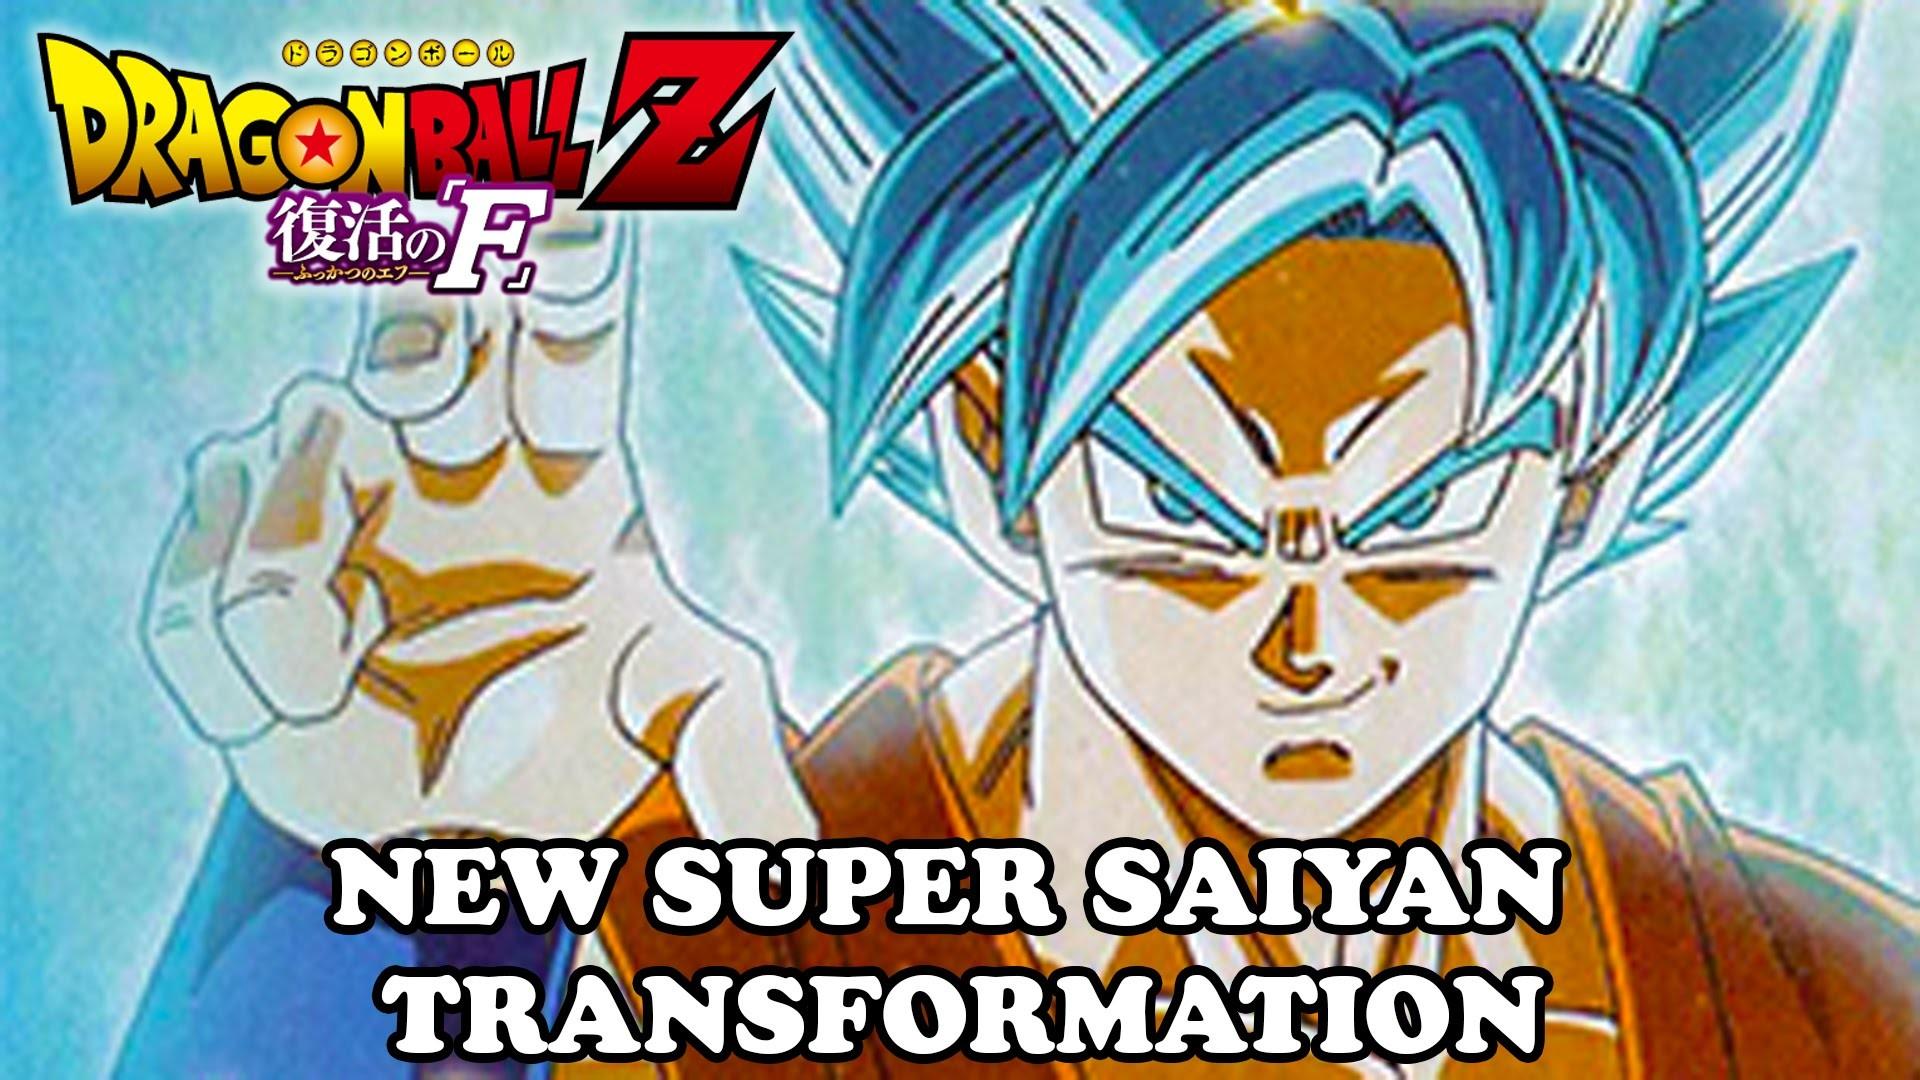 Dragon Ball Z: Goku's New Super Saiyan God Form Revealed【FULL HD】 – YouTube